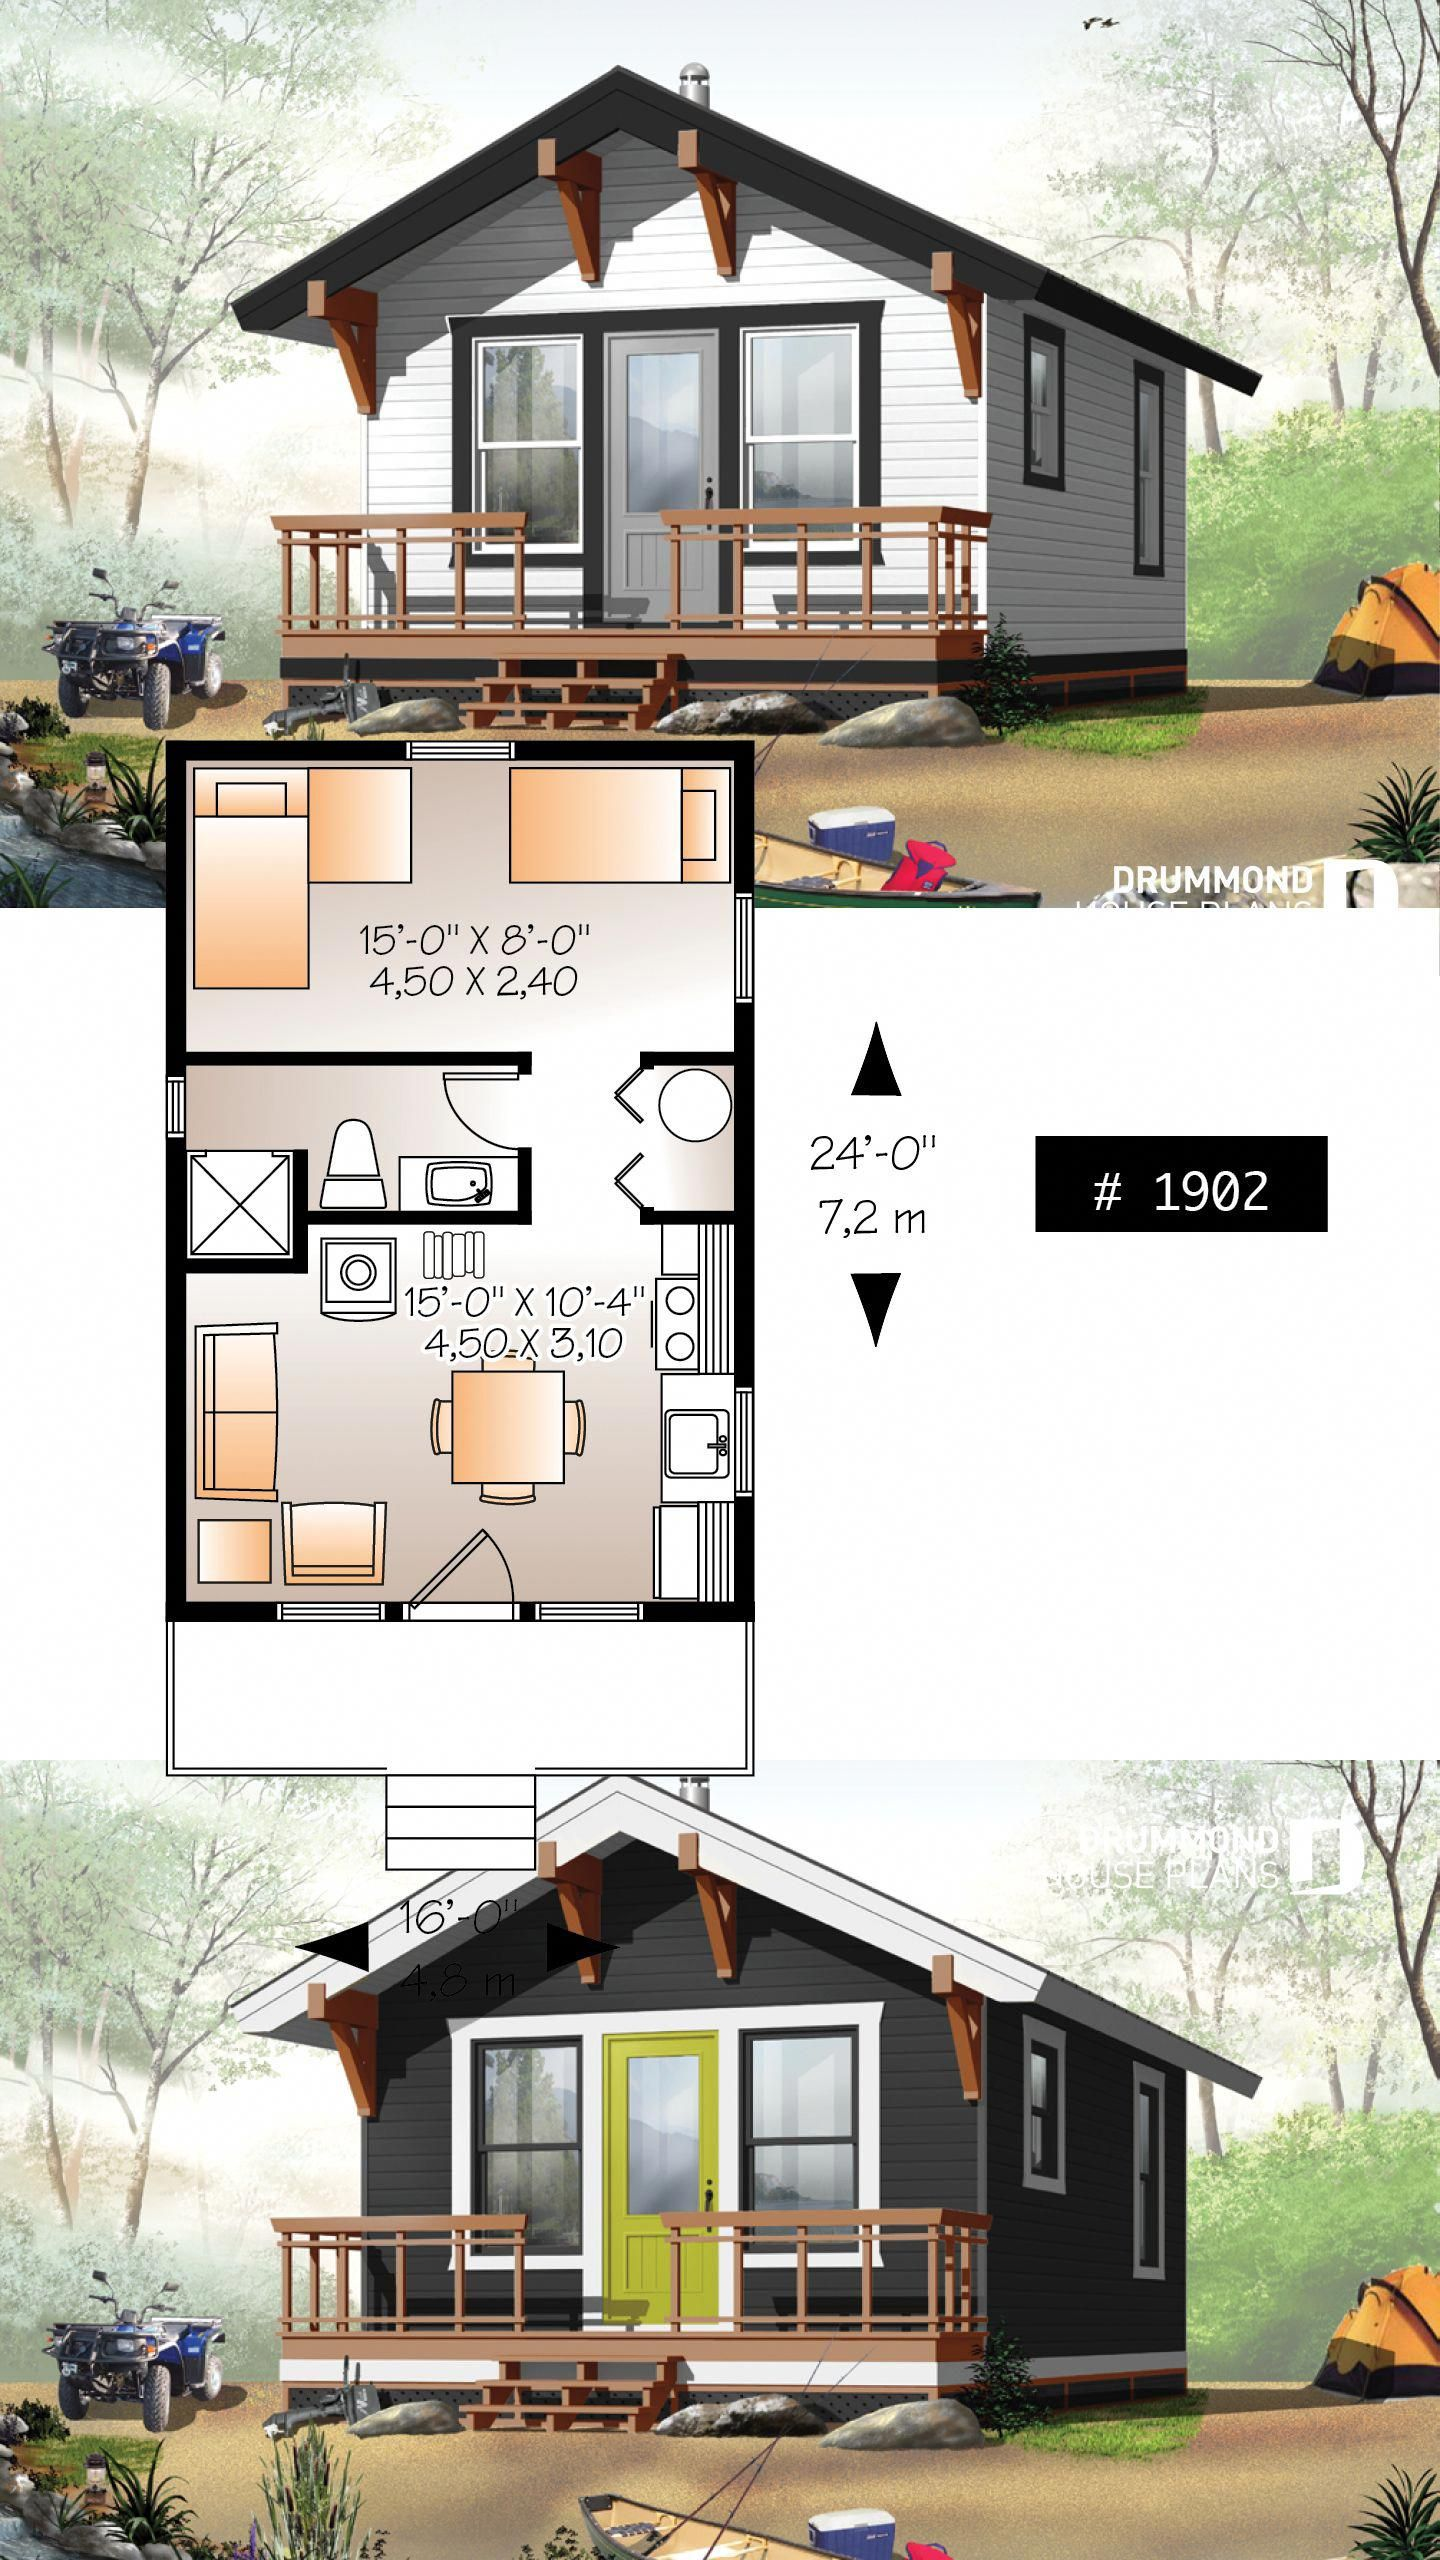 American Dream Homes Sognostanzedellacasa Tiny House Plans Tiny House Cabin Small House Design